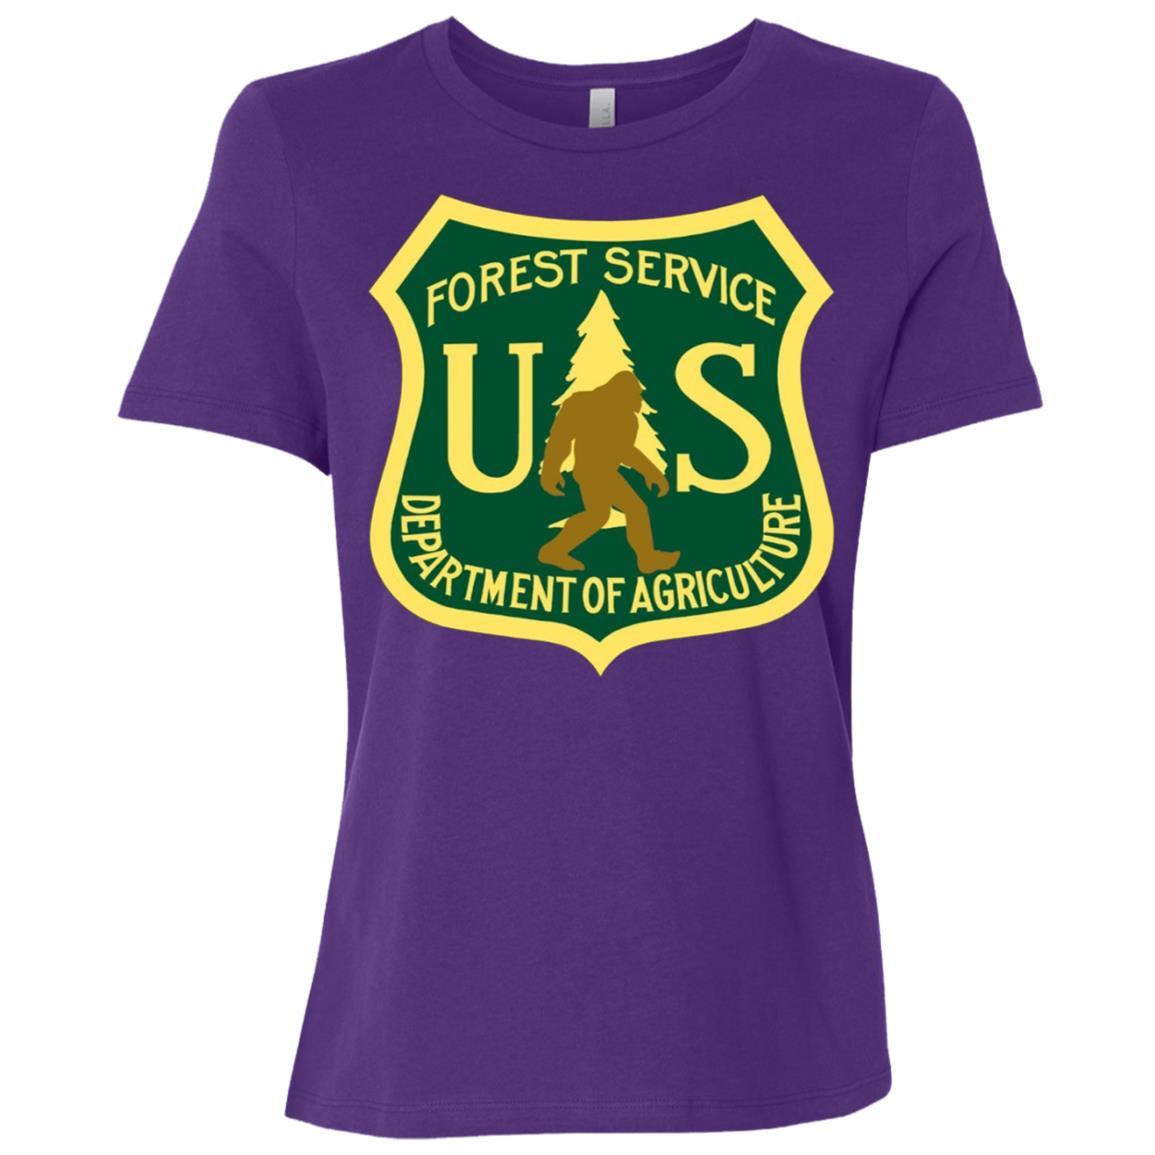 Bigfoot, Sasquatch, Yeti, USFS, Funny, Women Short Sleeve T-Shirt